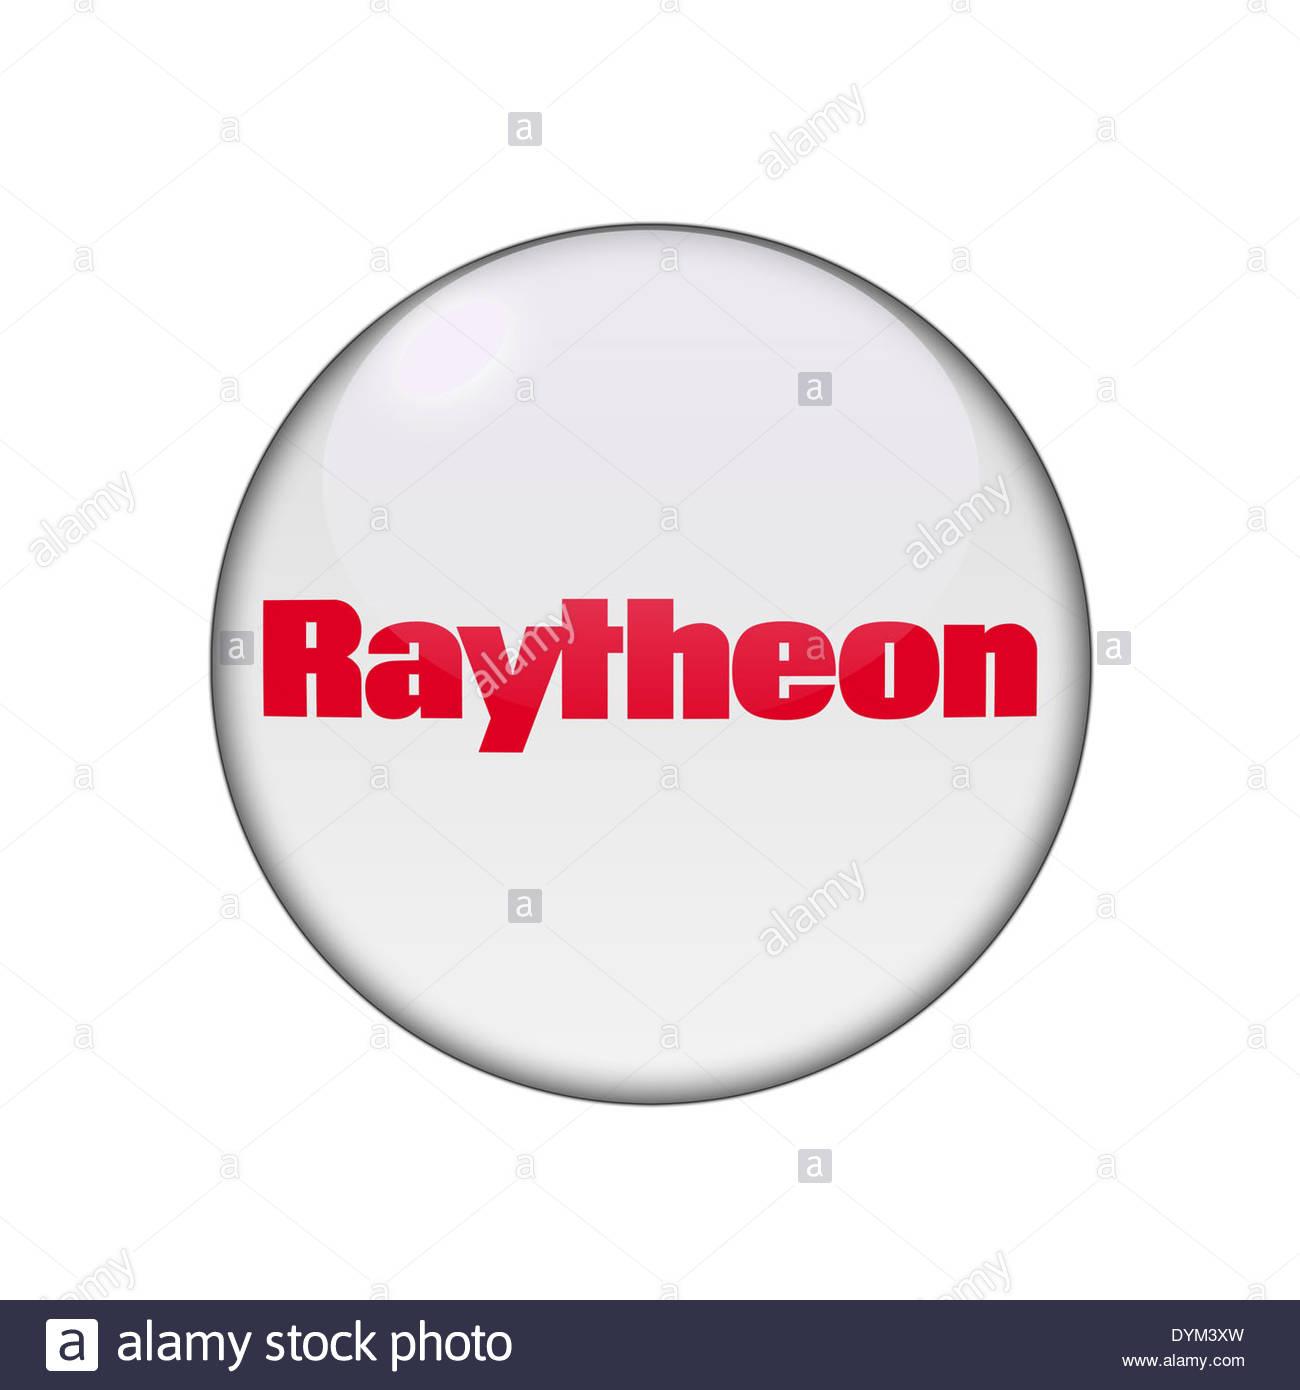 Raytheon icon logo - Stock Image